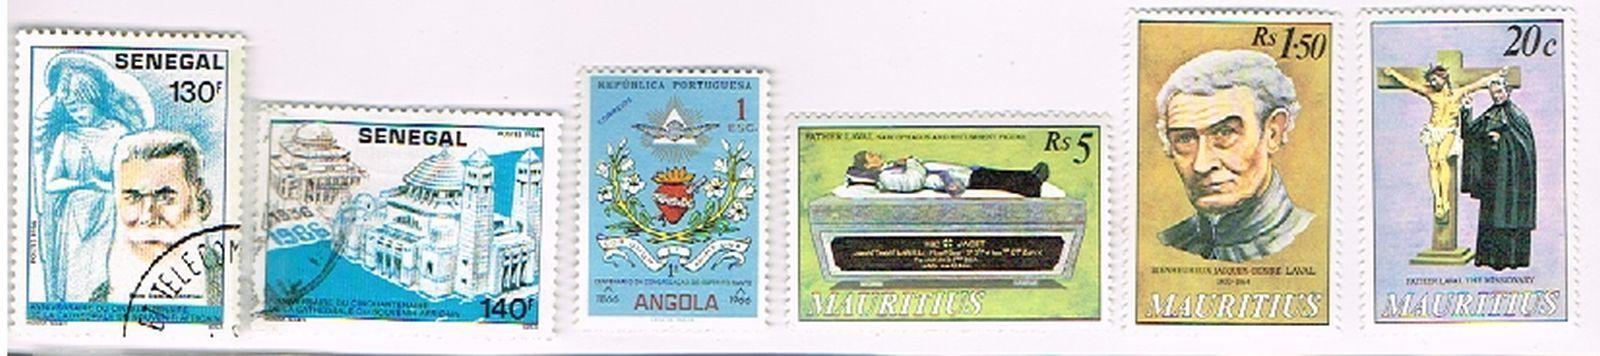 Spiritan-Missionary-Stamp-Bank